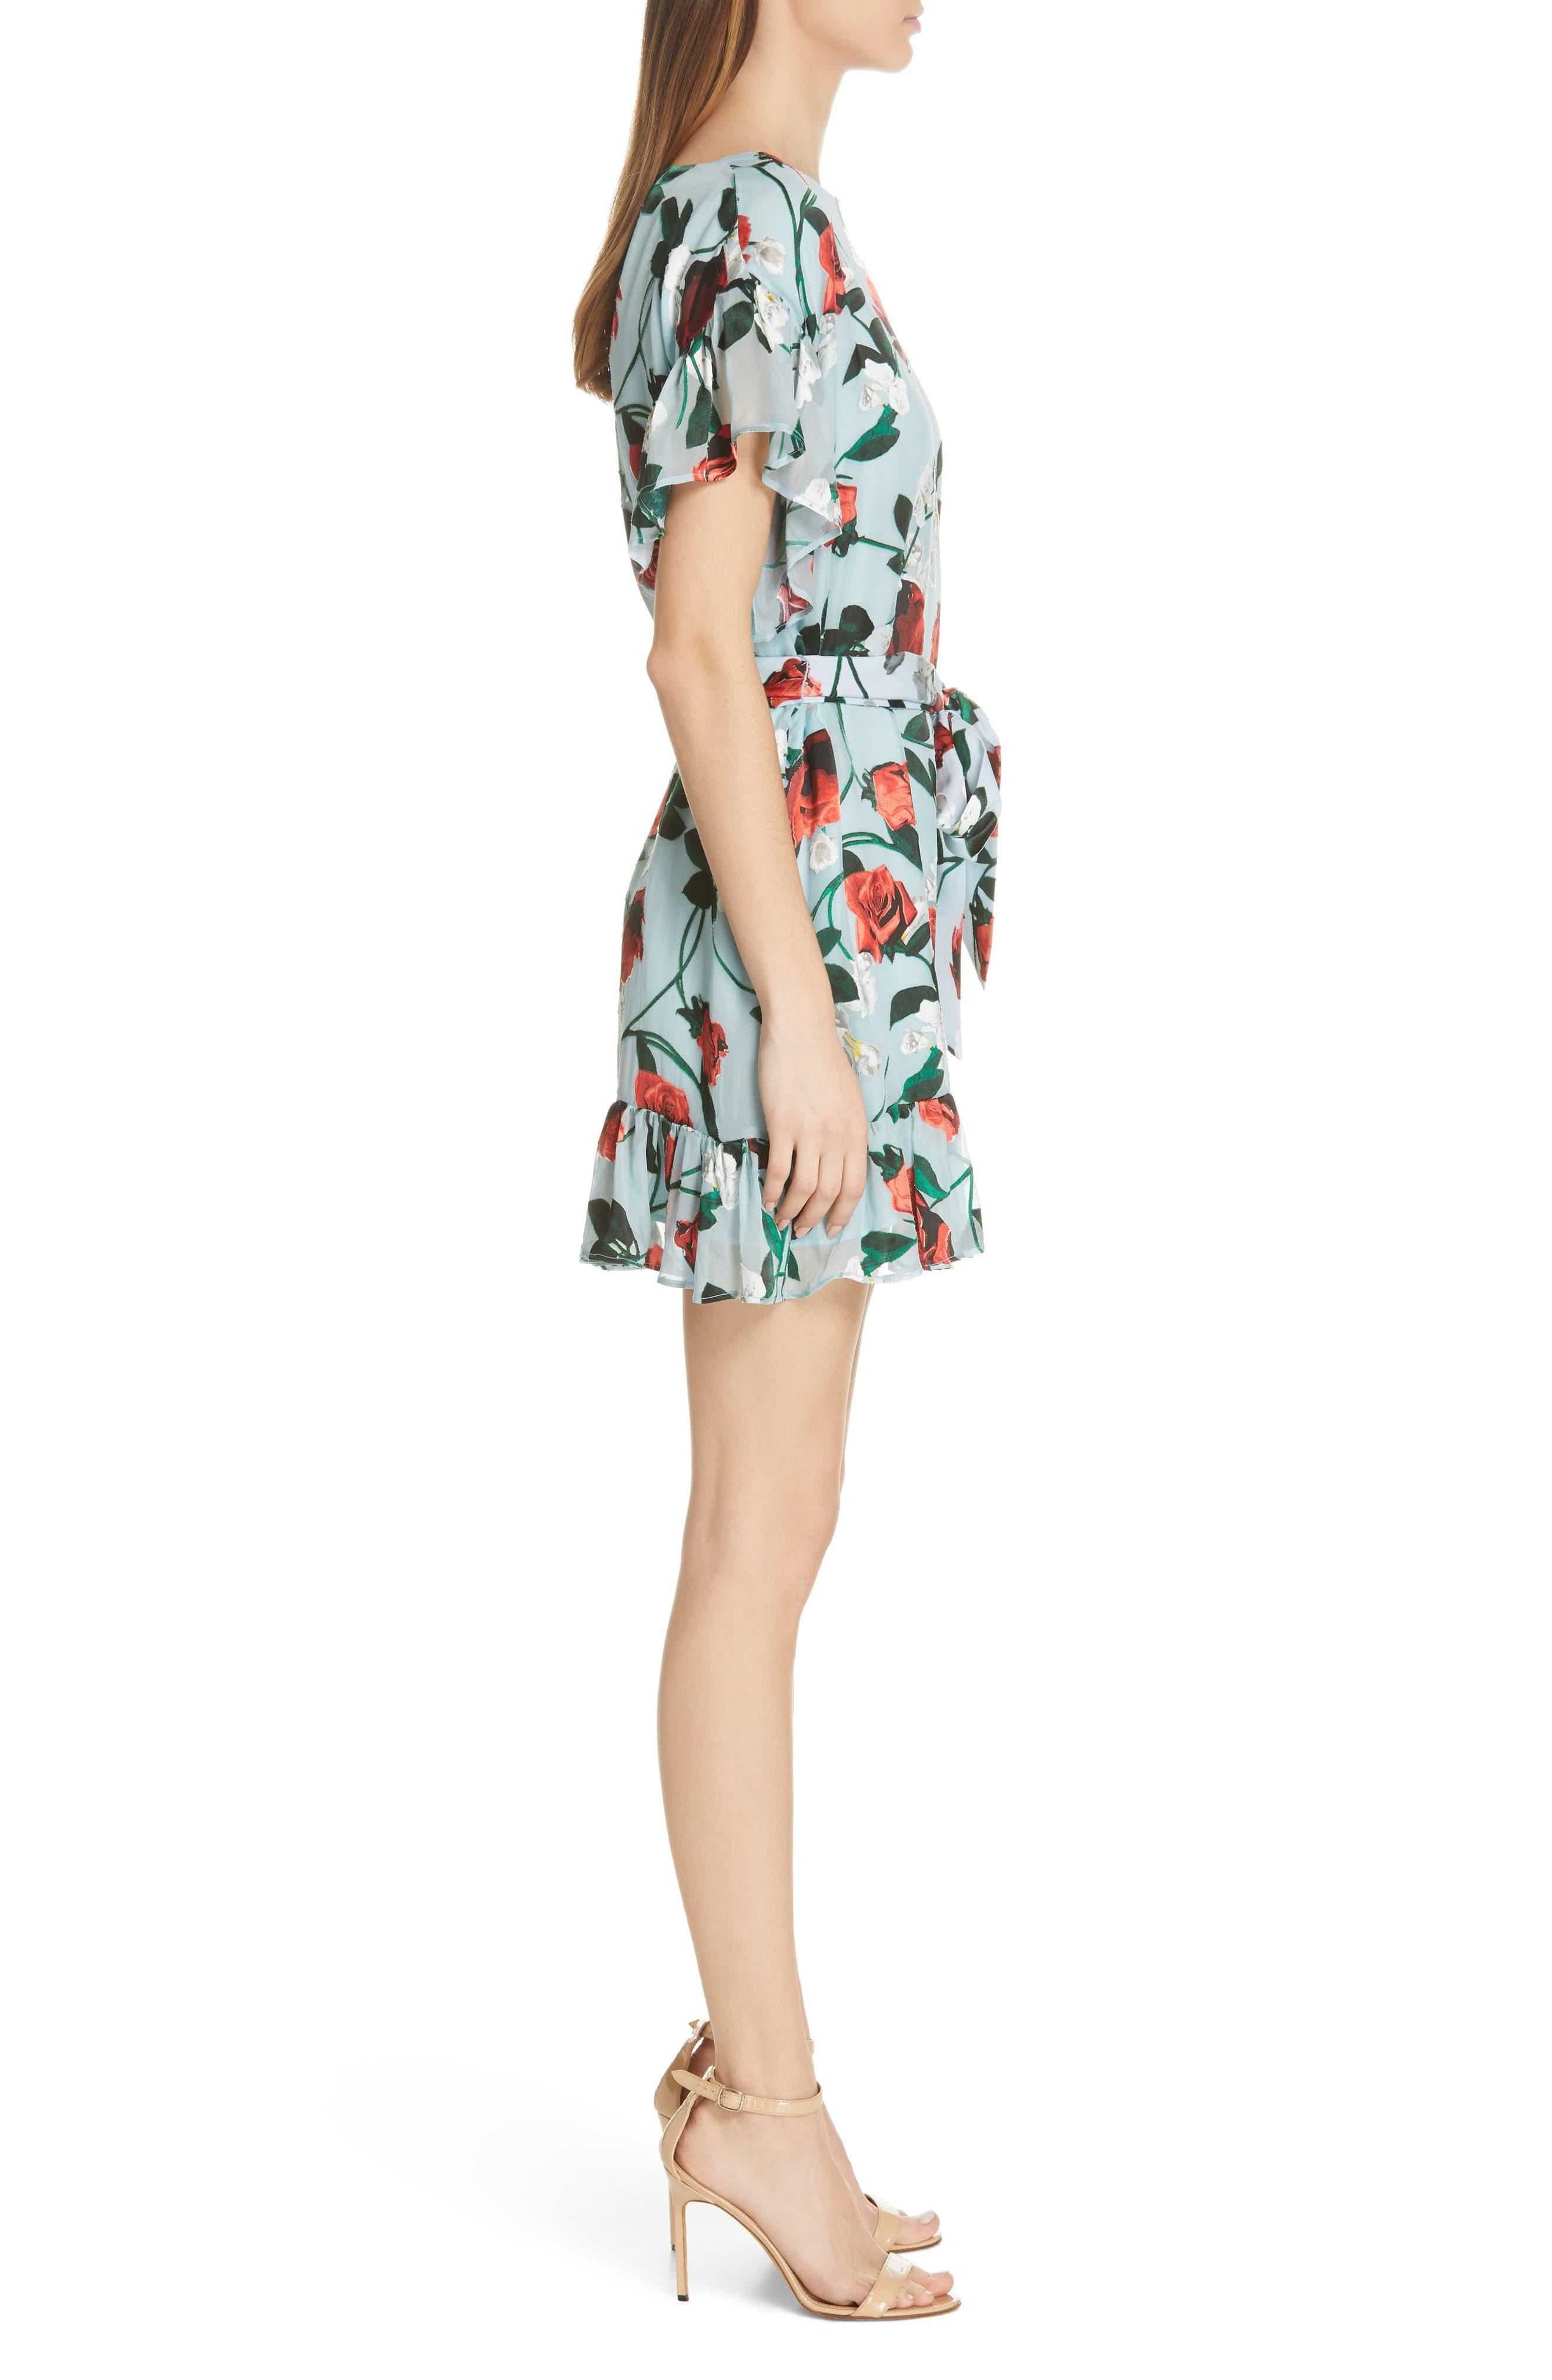 Ellamae Ruffle Sleeve Dress,                             Alternate thumbnail 3, color,                             ROSEBUD FLORAL POWDER BLUE